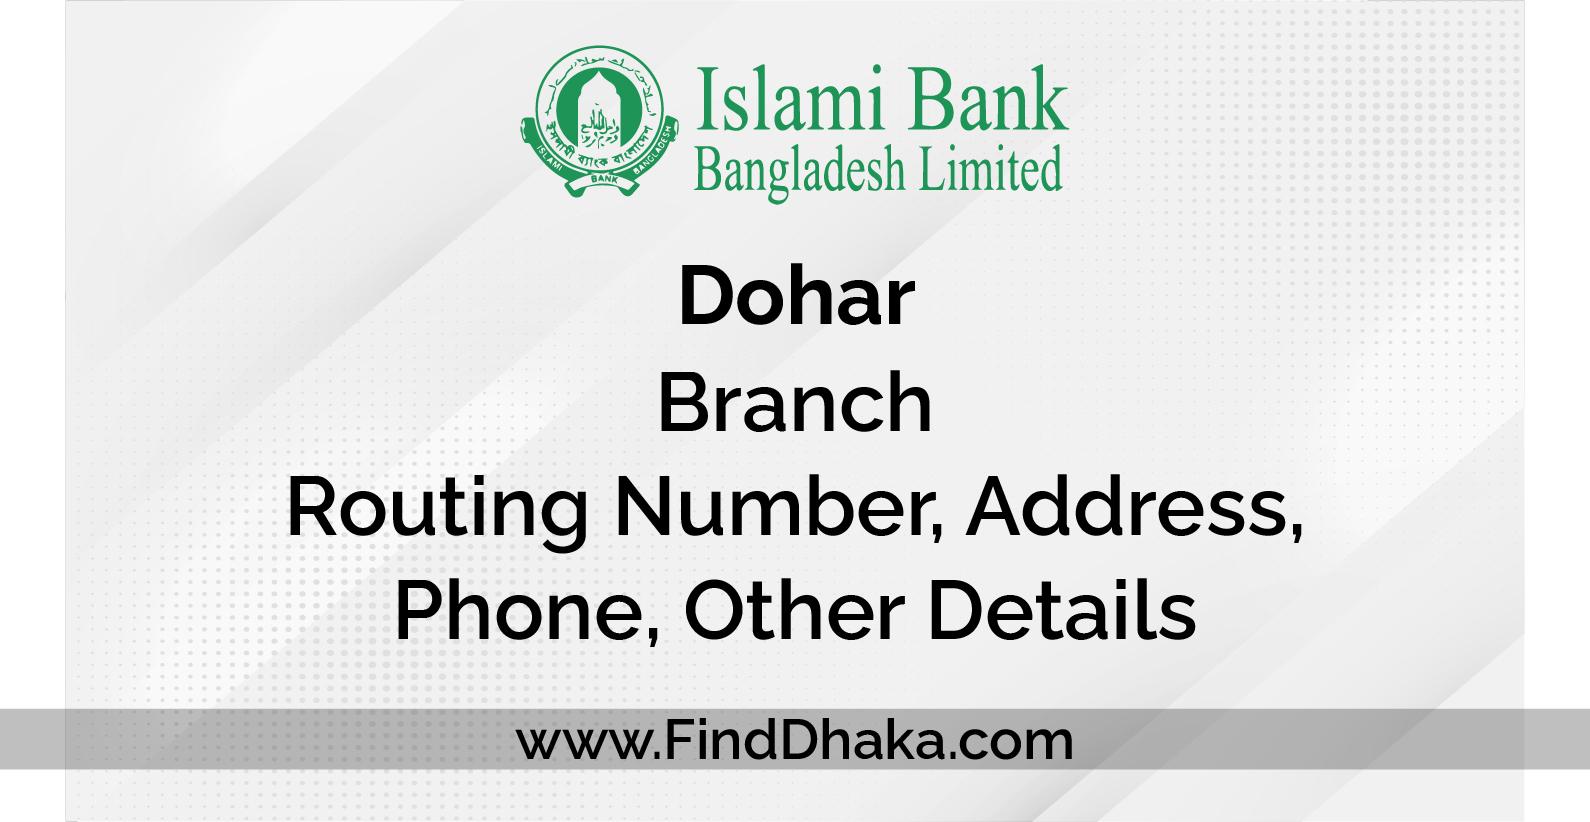 Photo of Islami Bank Dohar Branch